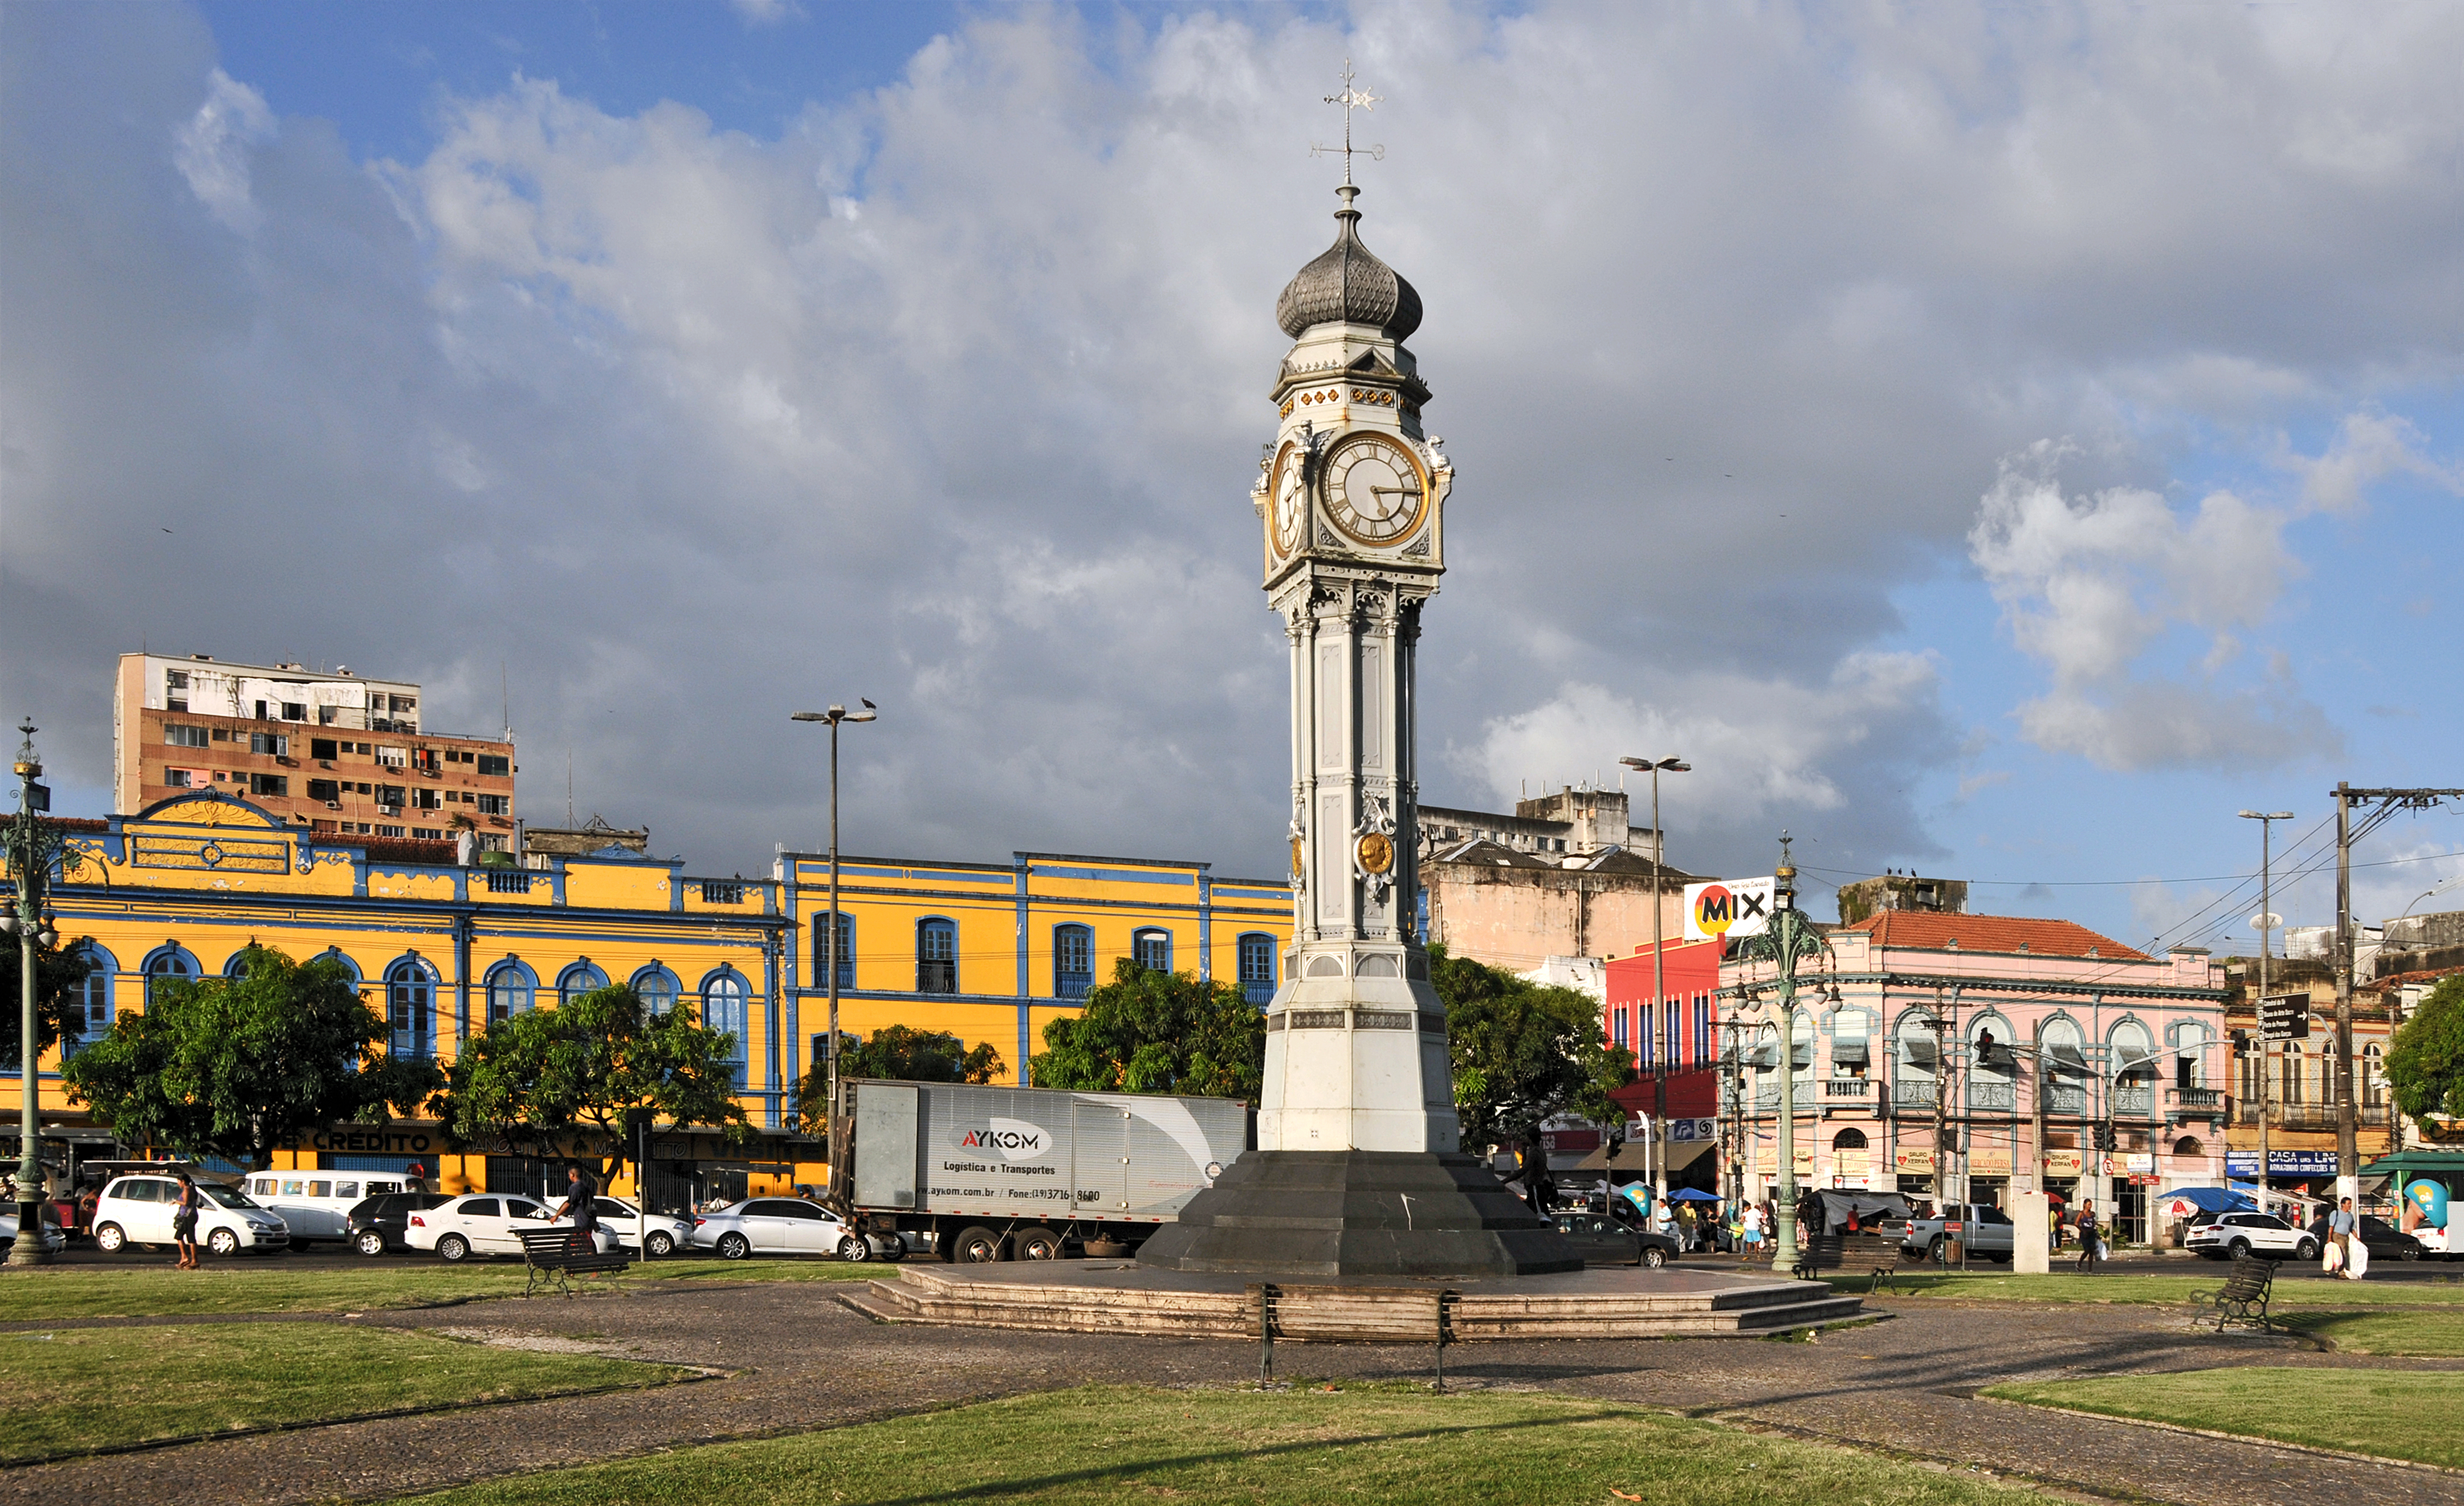 Belém_Praça_do_Relógio_Clock_Place_01